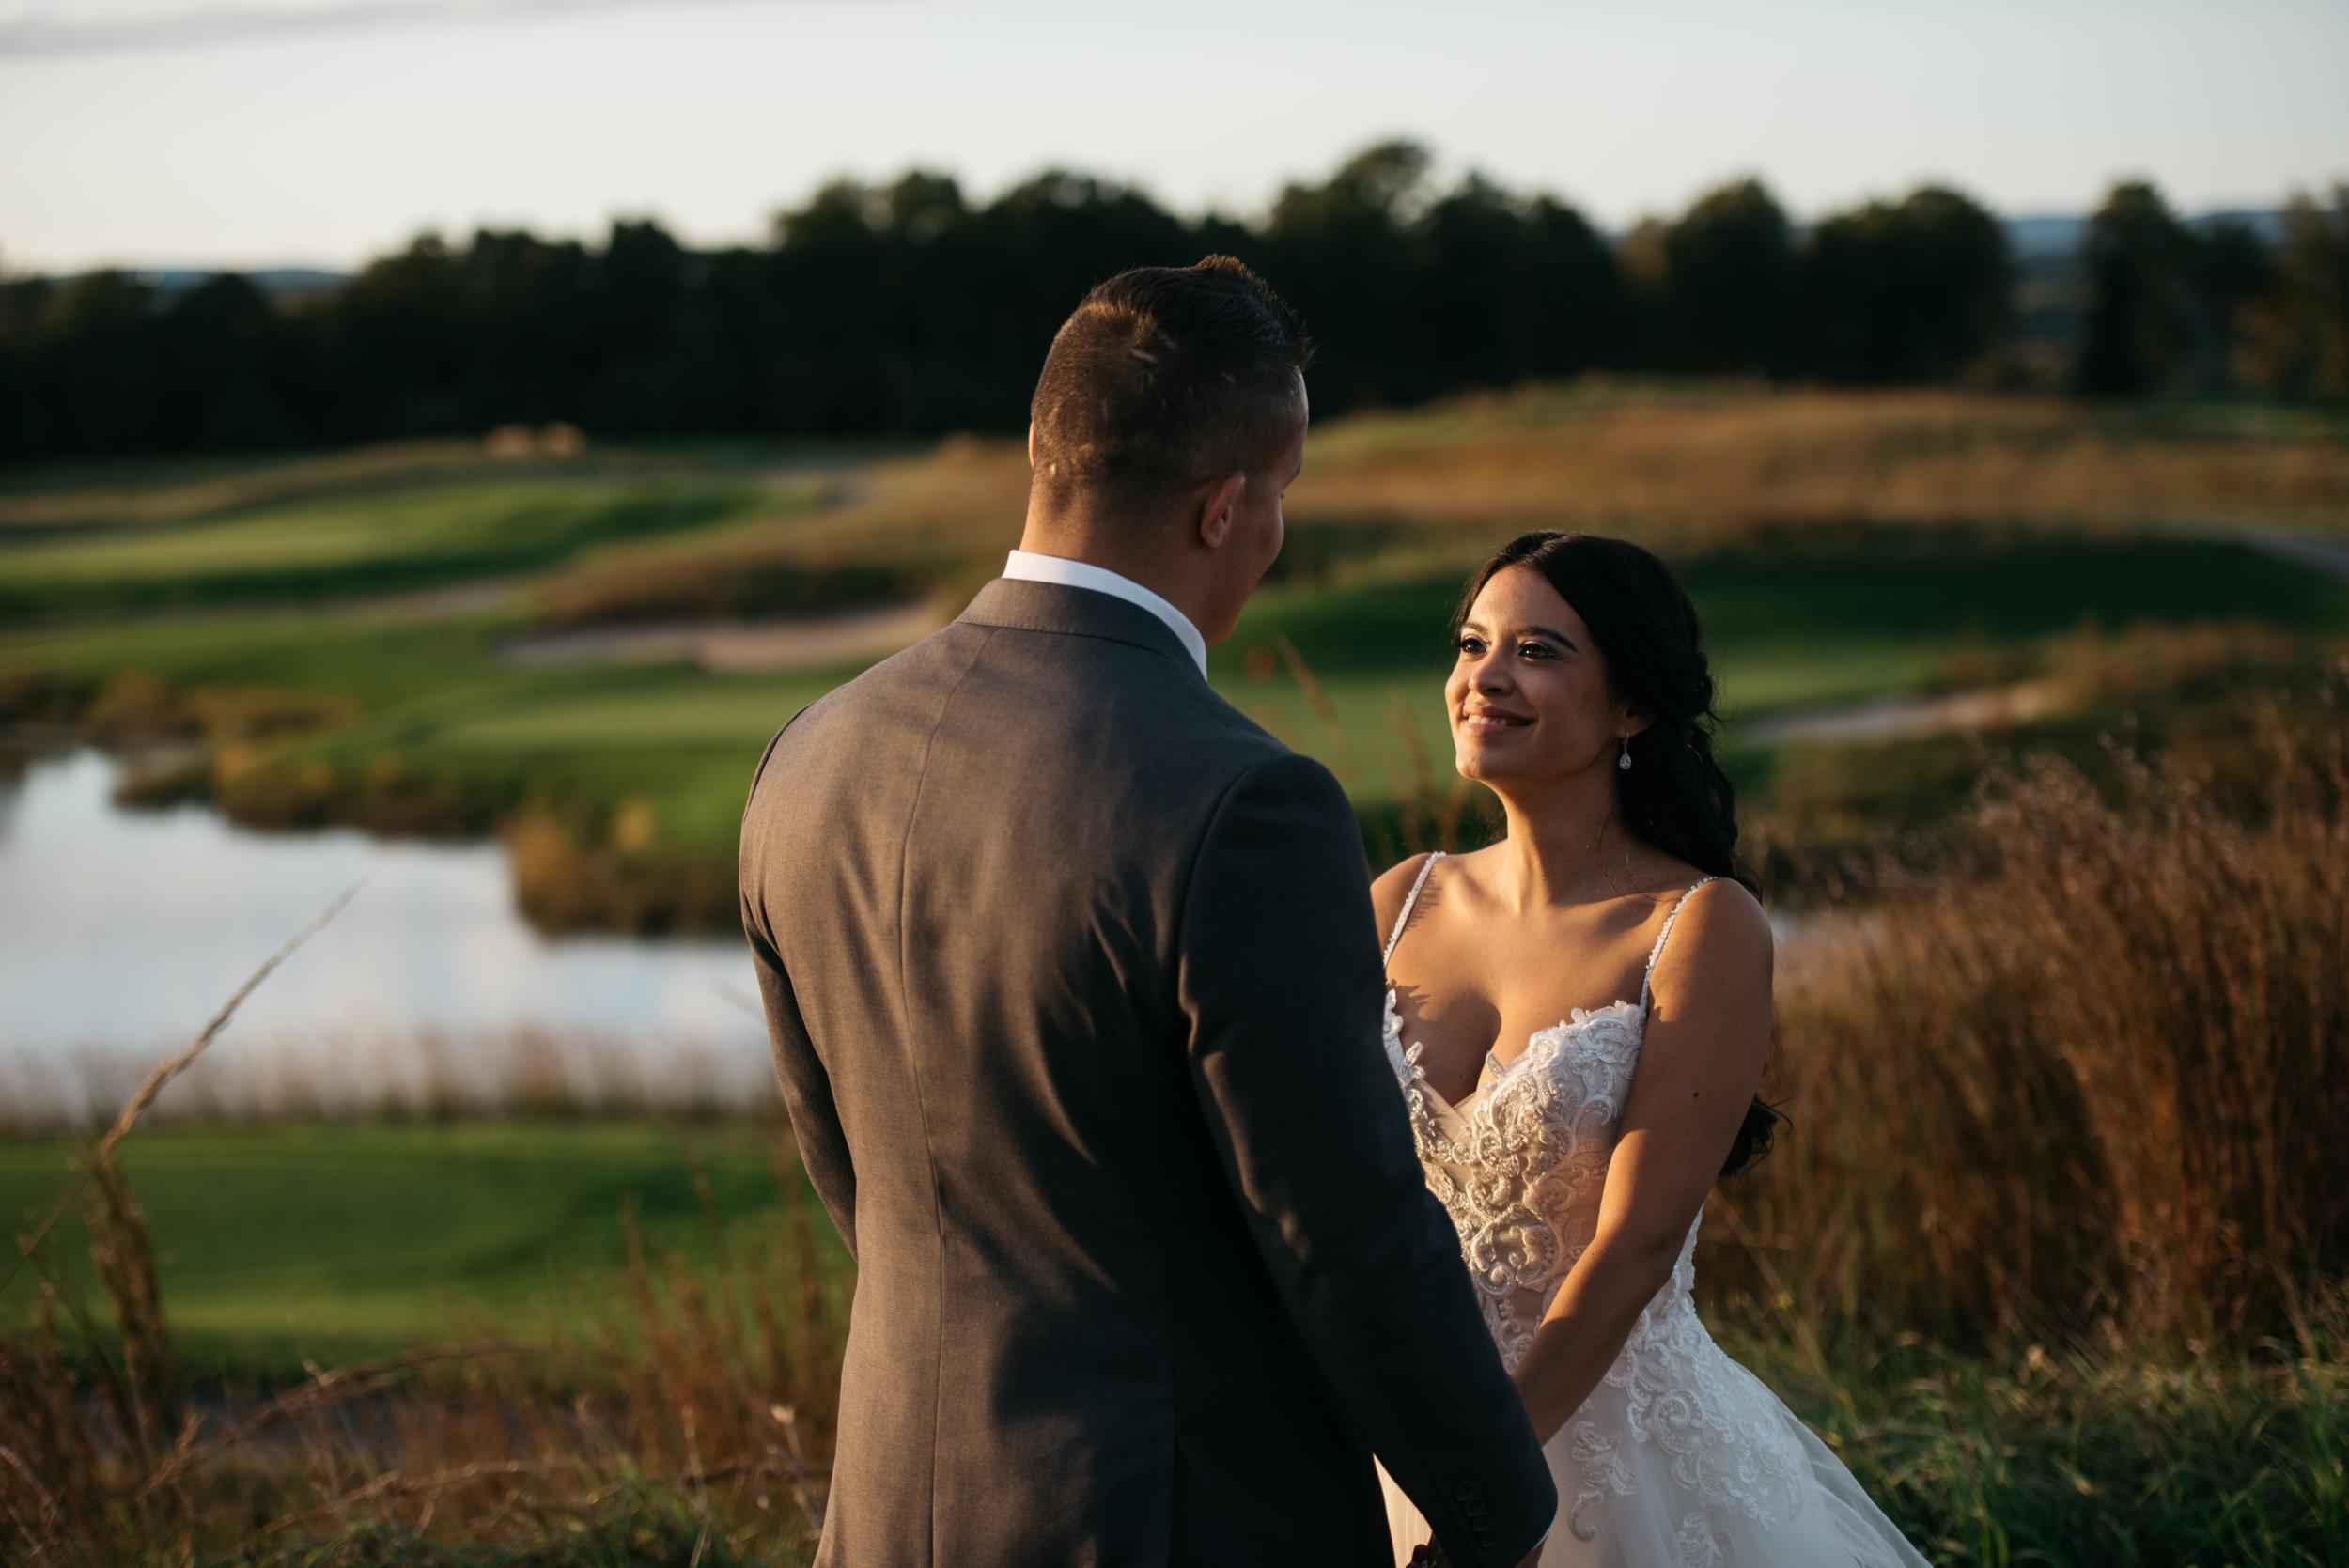 WeddingPhotos | NJPhotographer | Highlights-12-12.jpg